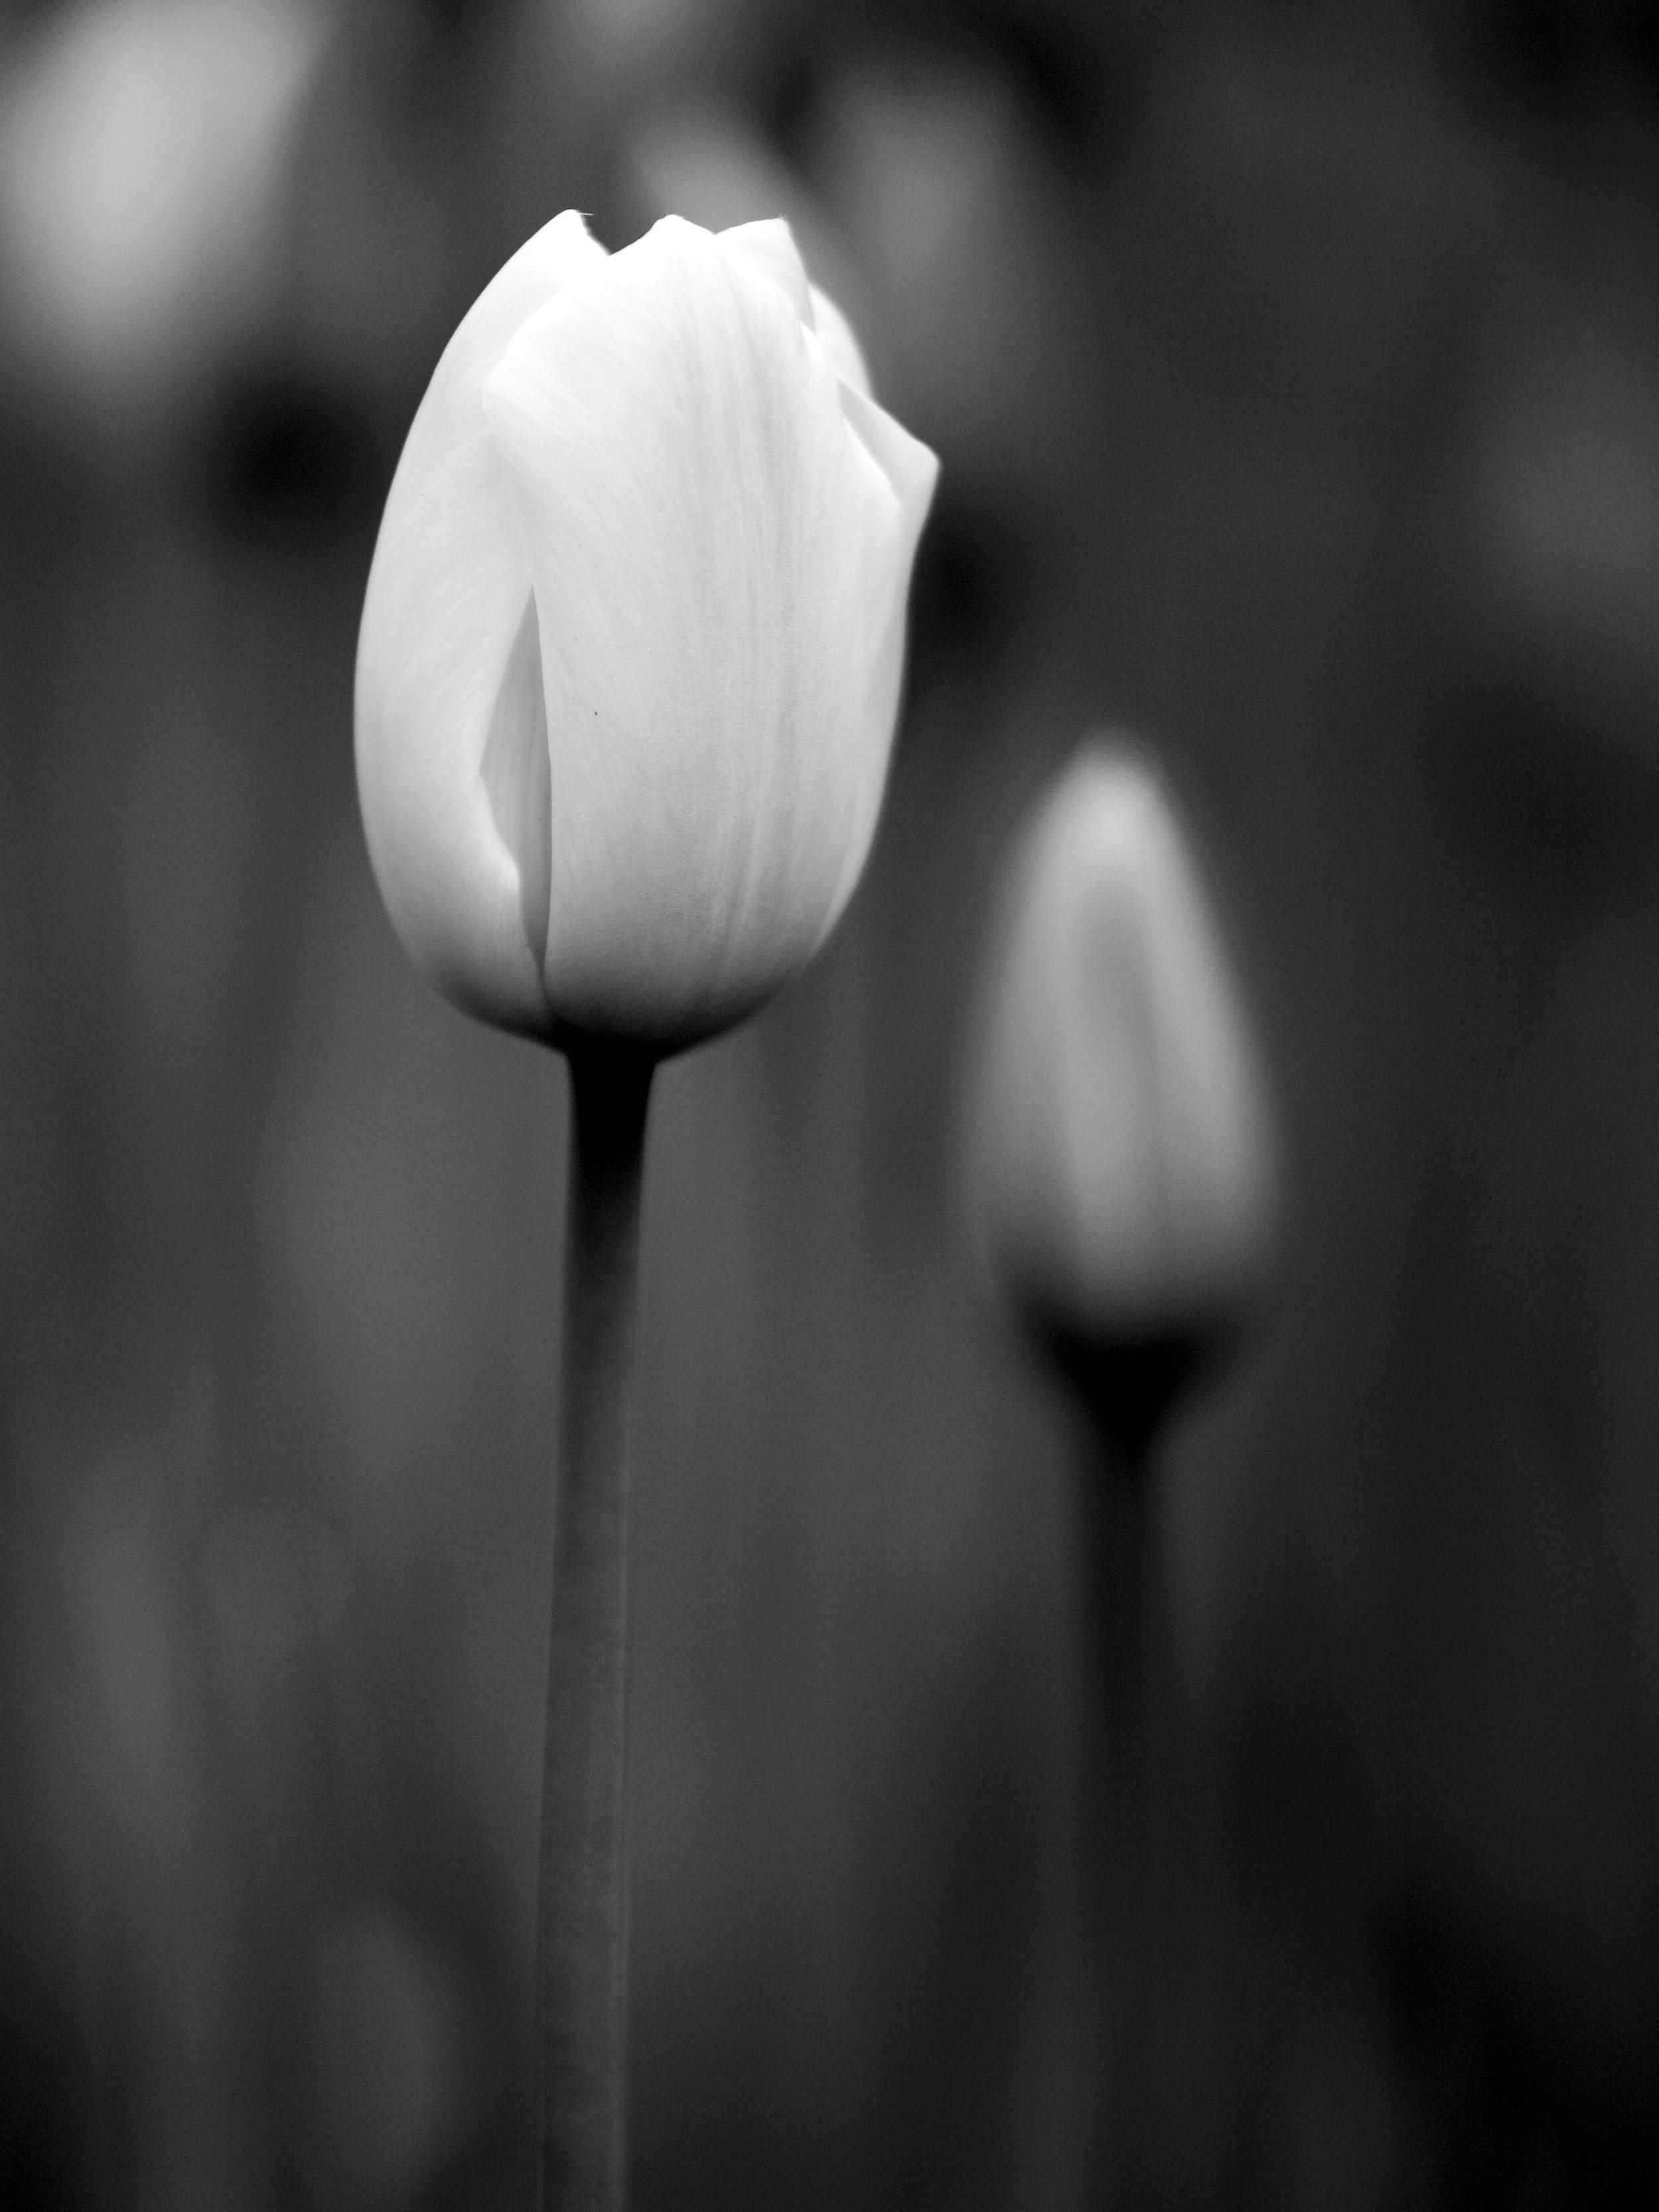 tulips-P9Q7JLF.jpg